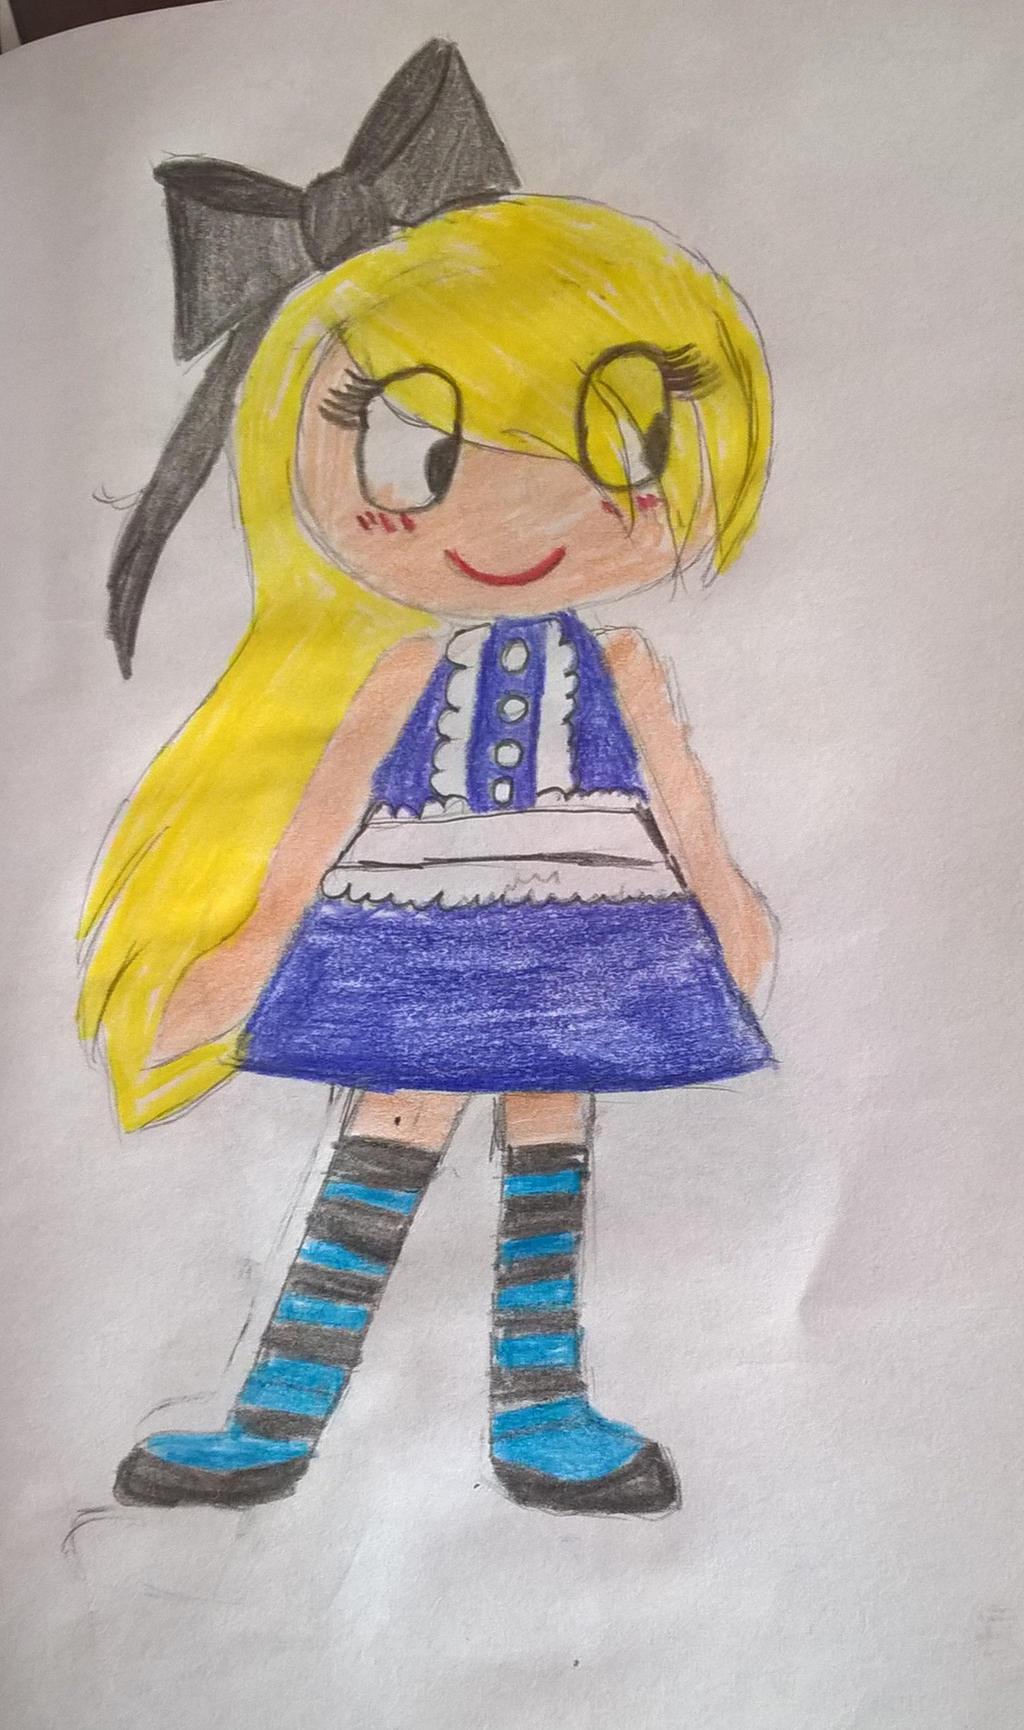 Alice in wonderland chibi version by Lunajula